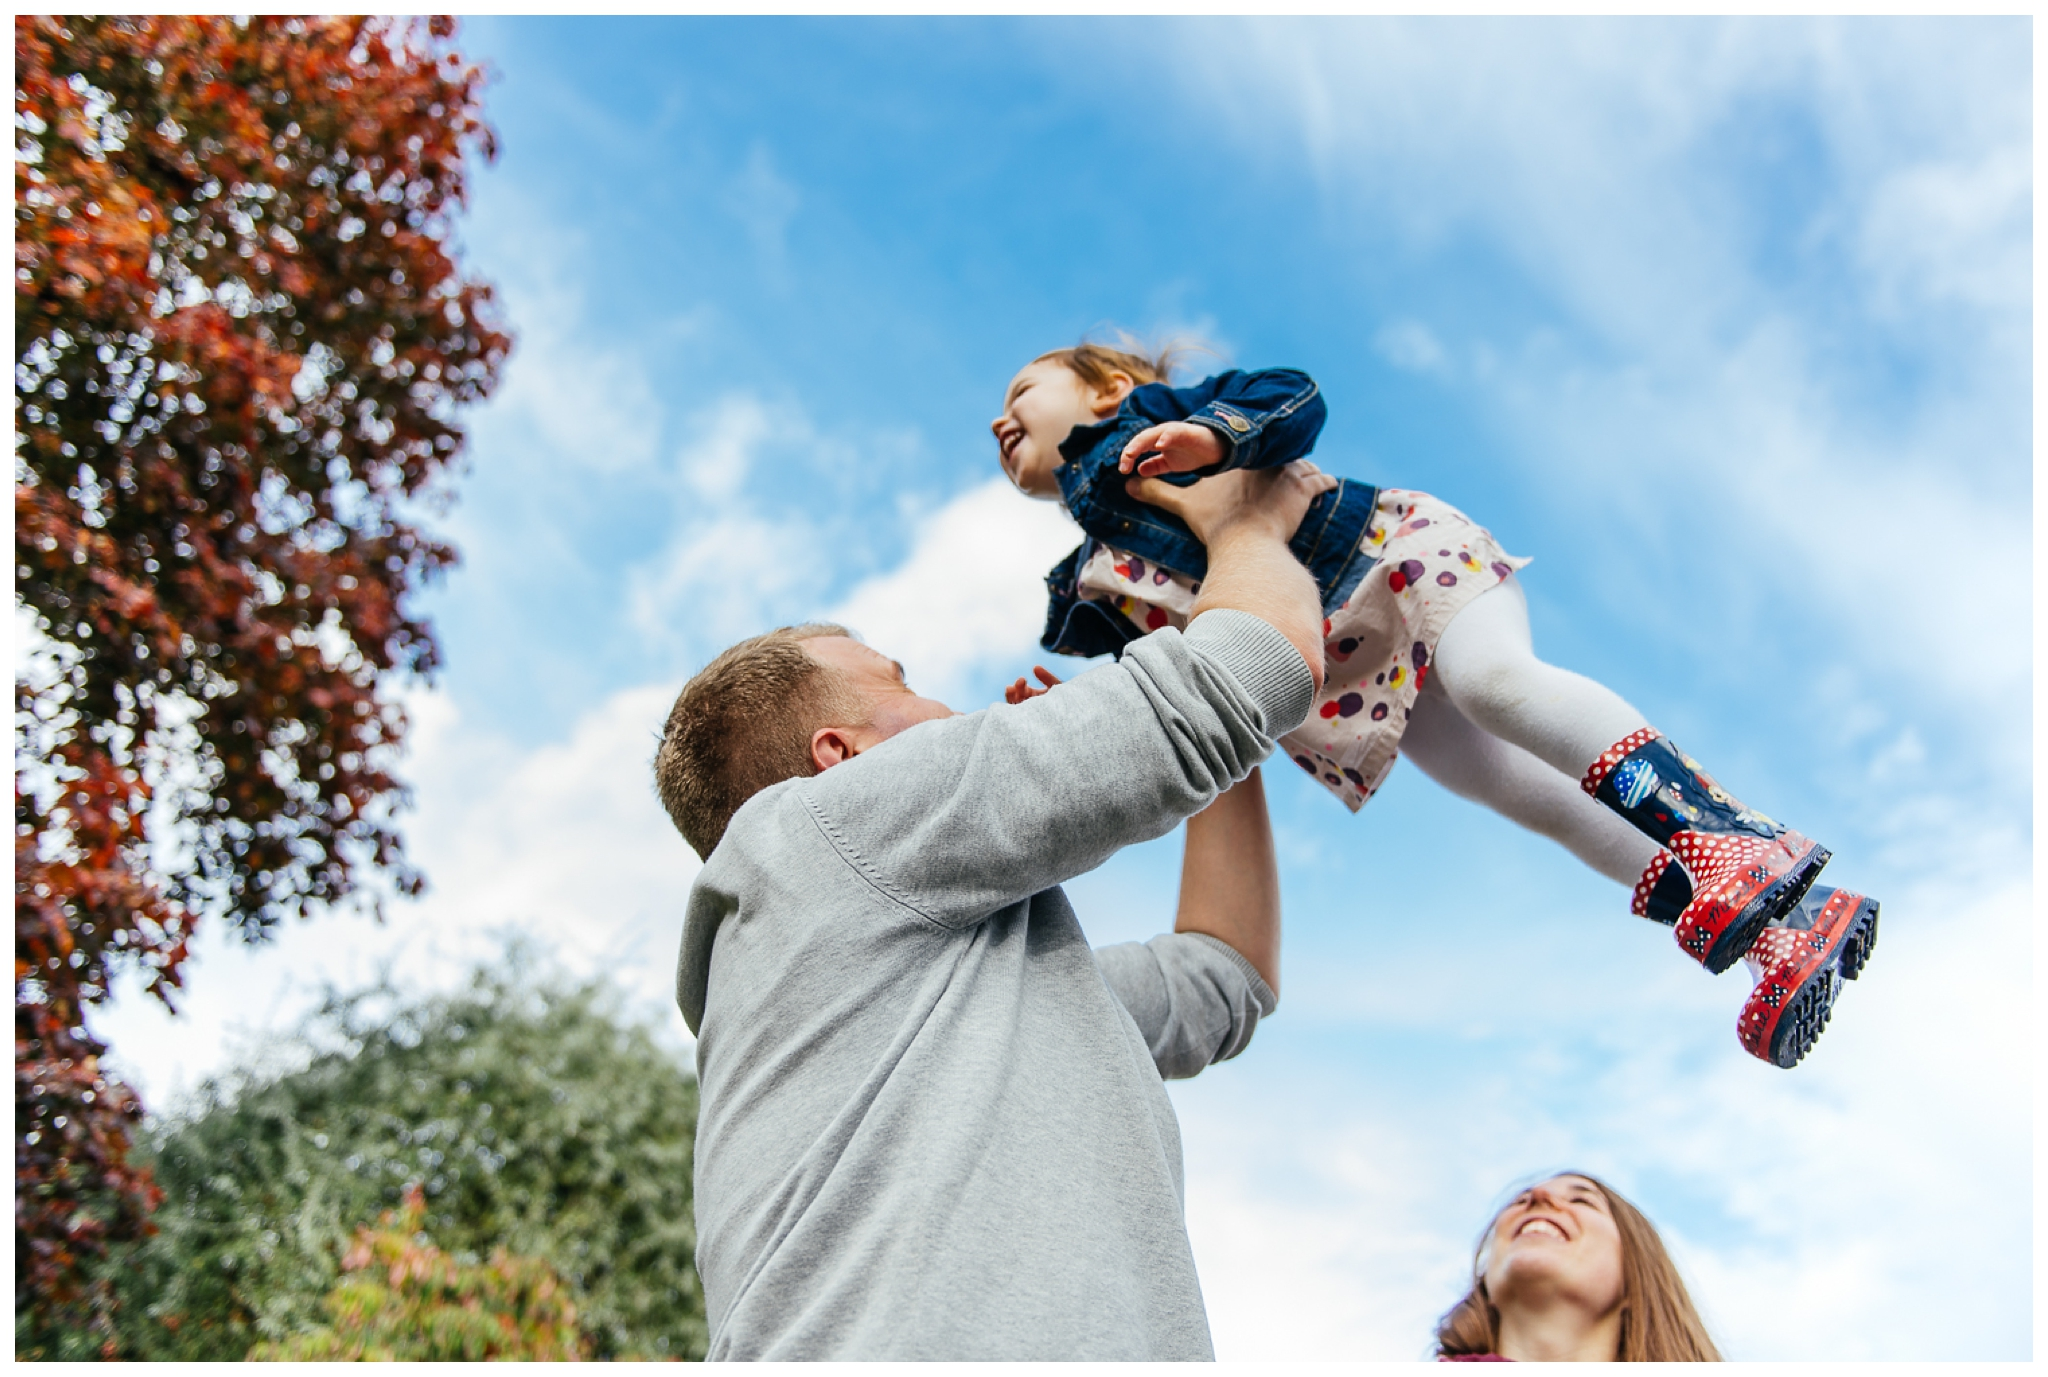 Autumn-family-portraits-birmingham-photographer_0027.jpg